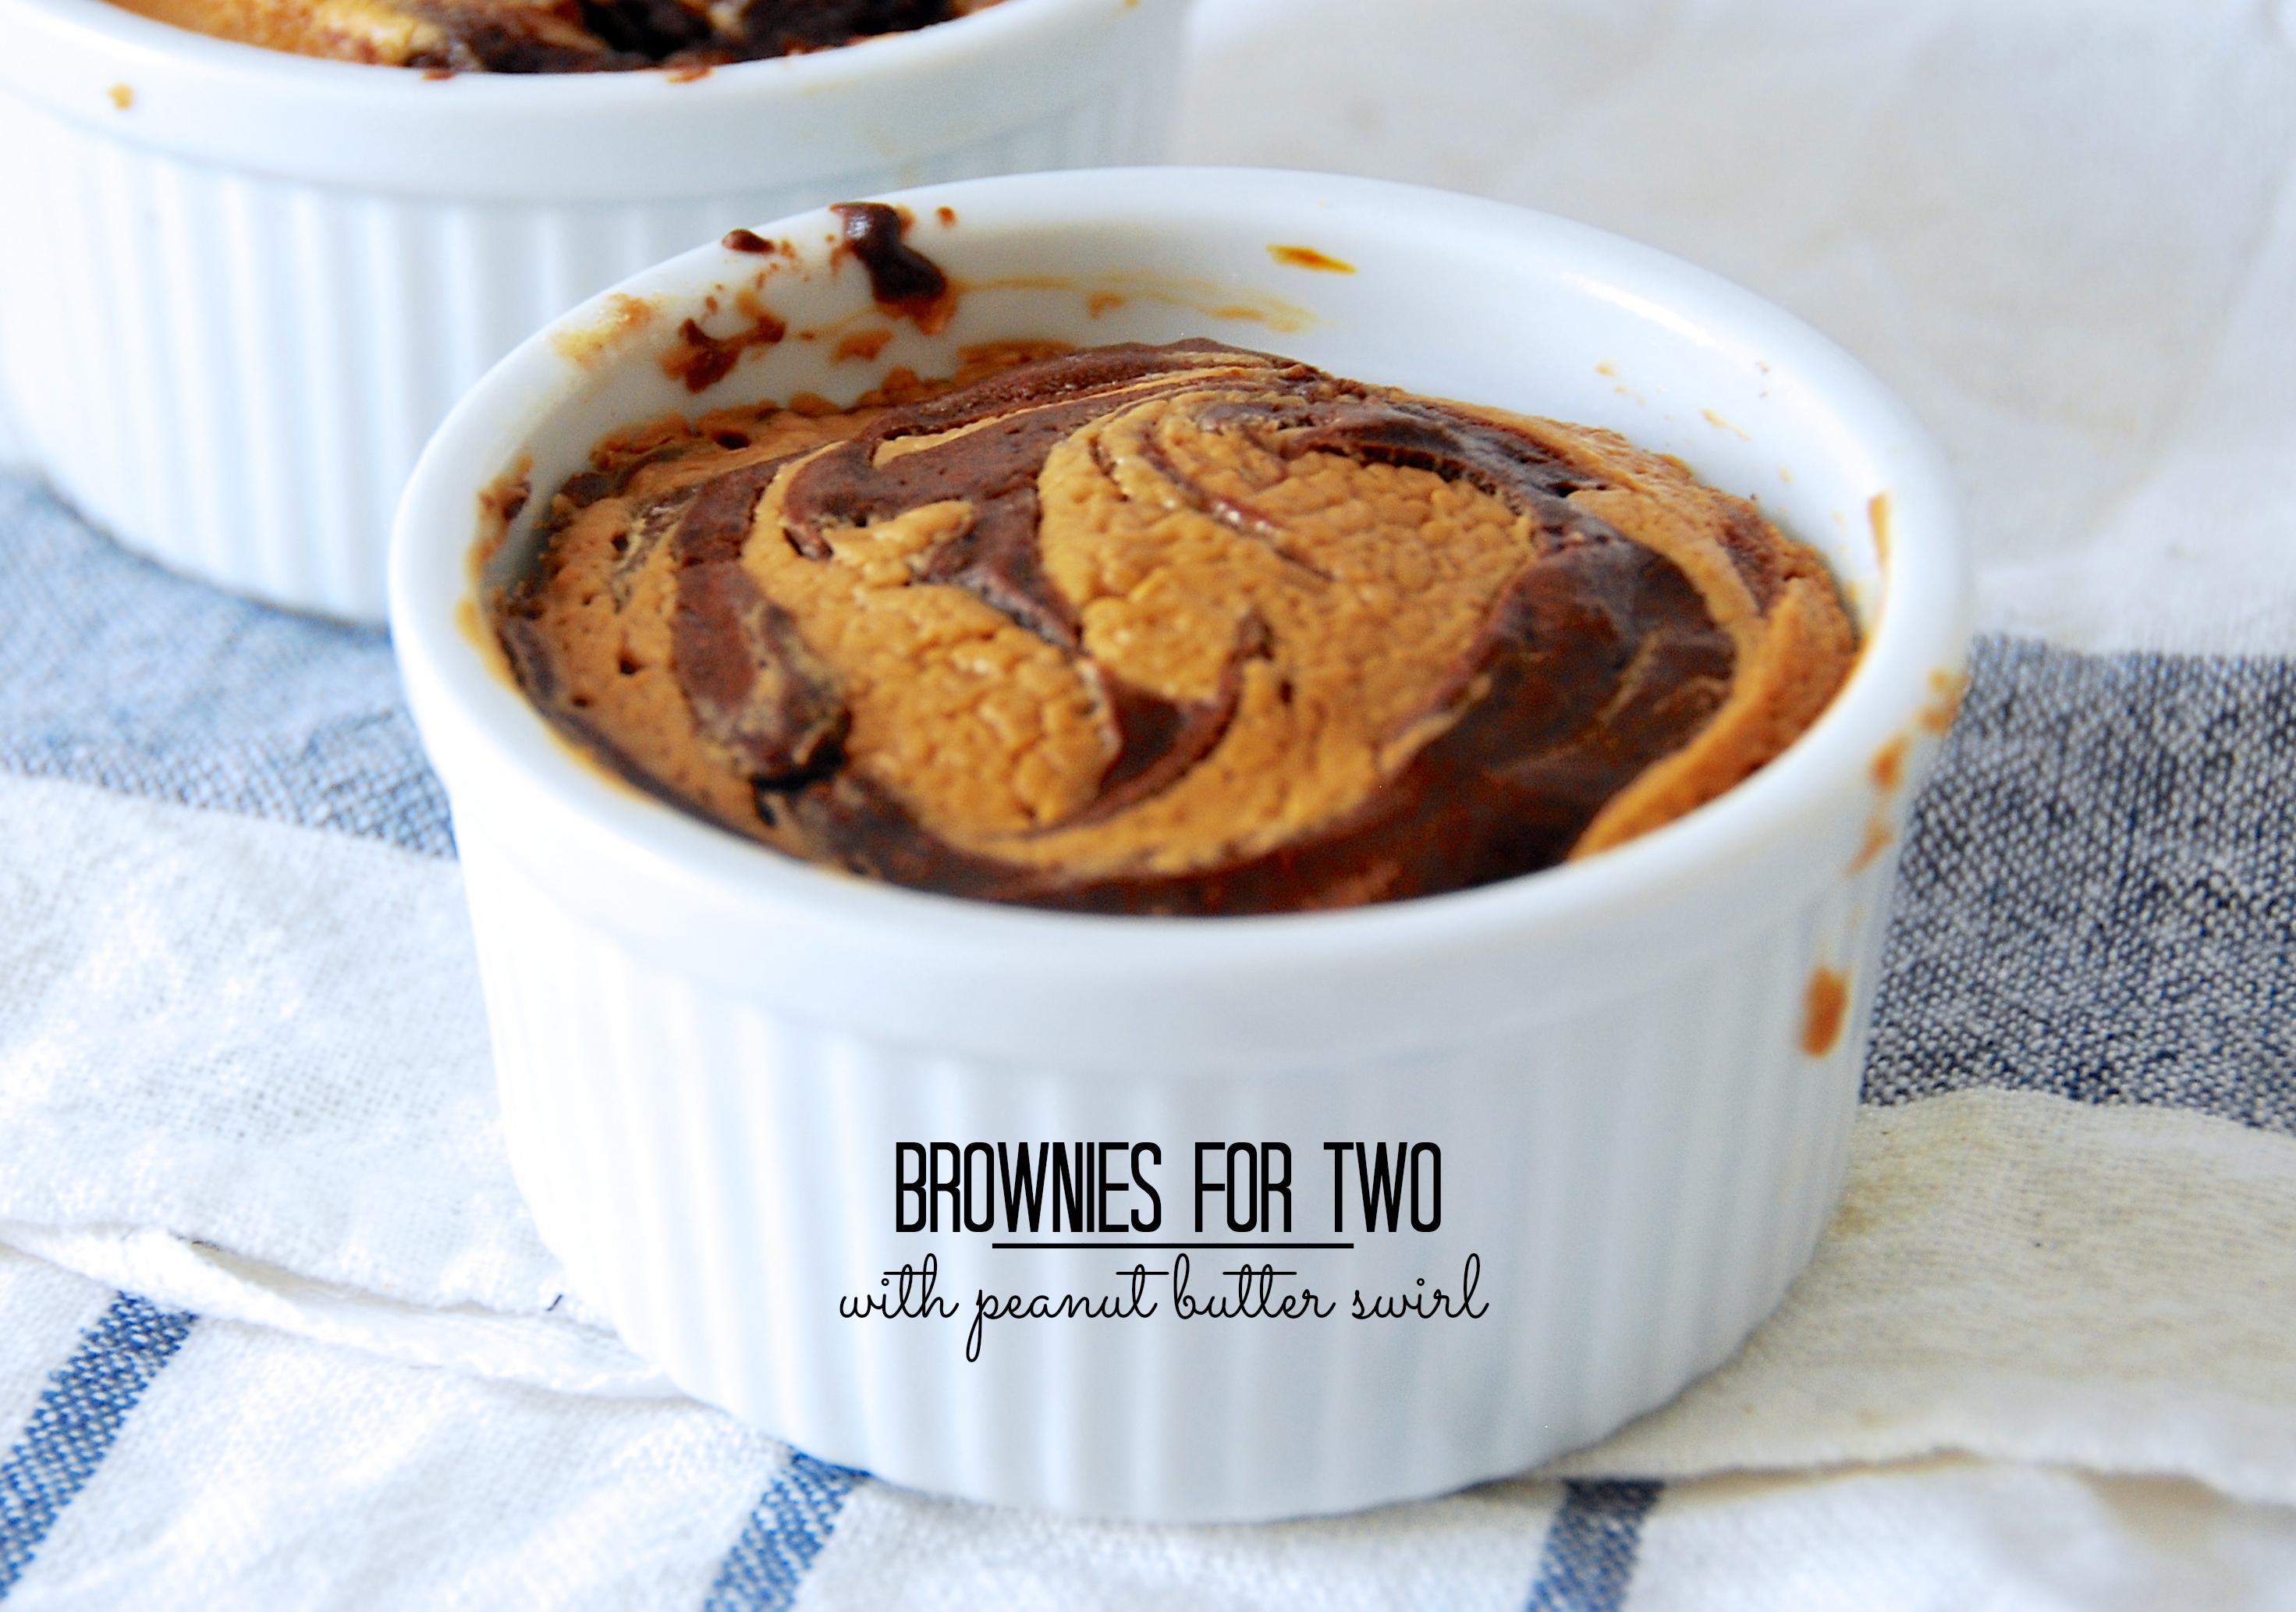 peanut-butter-swirl-brownies-caption